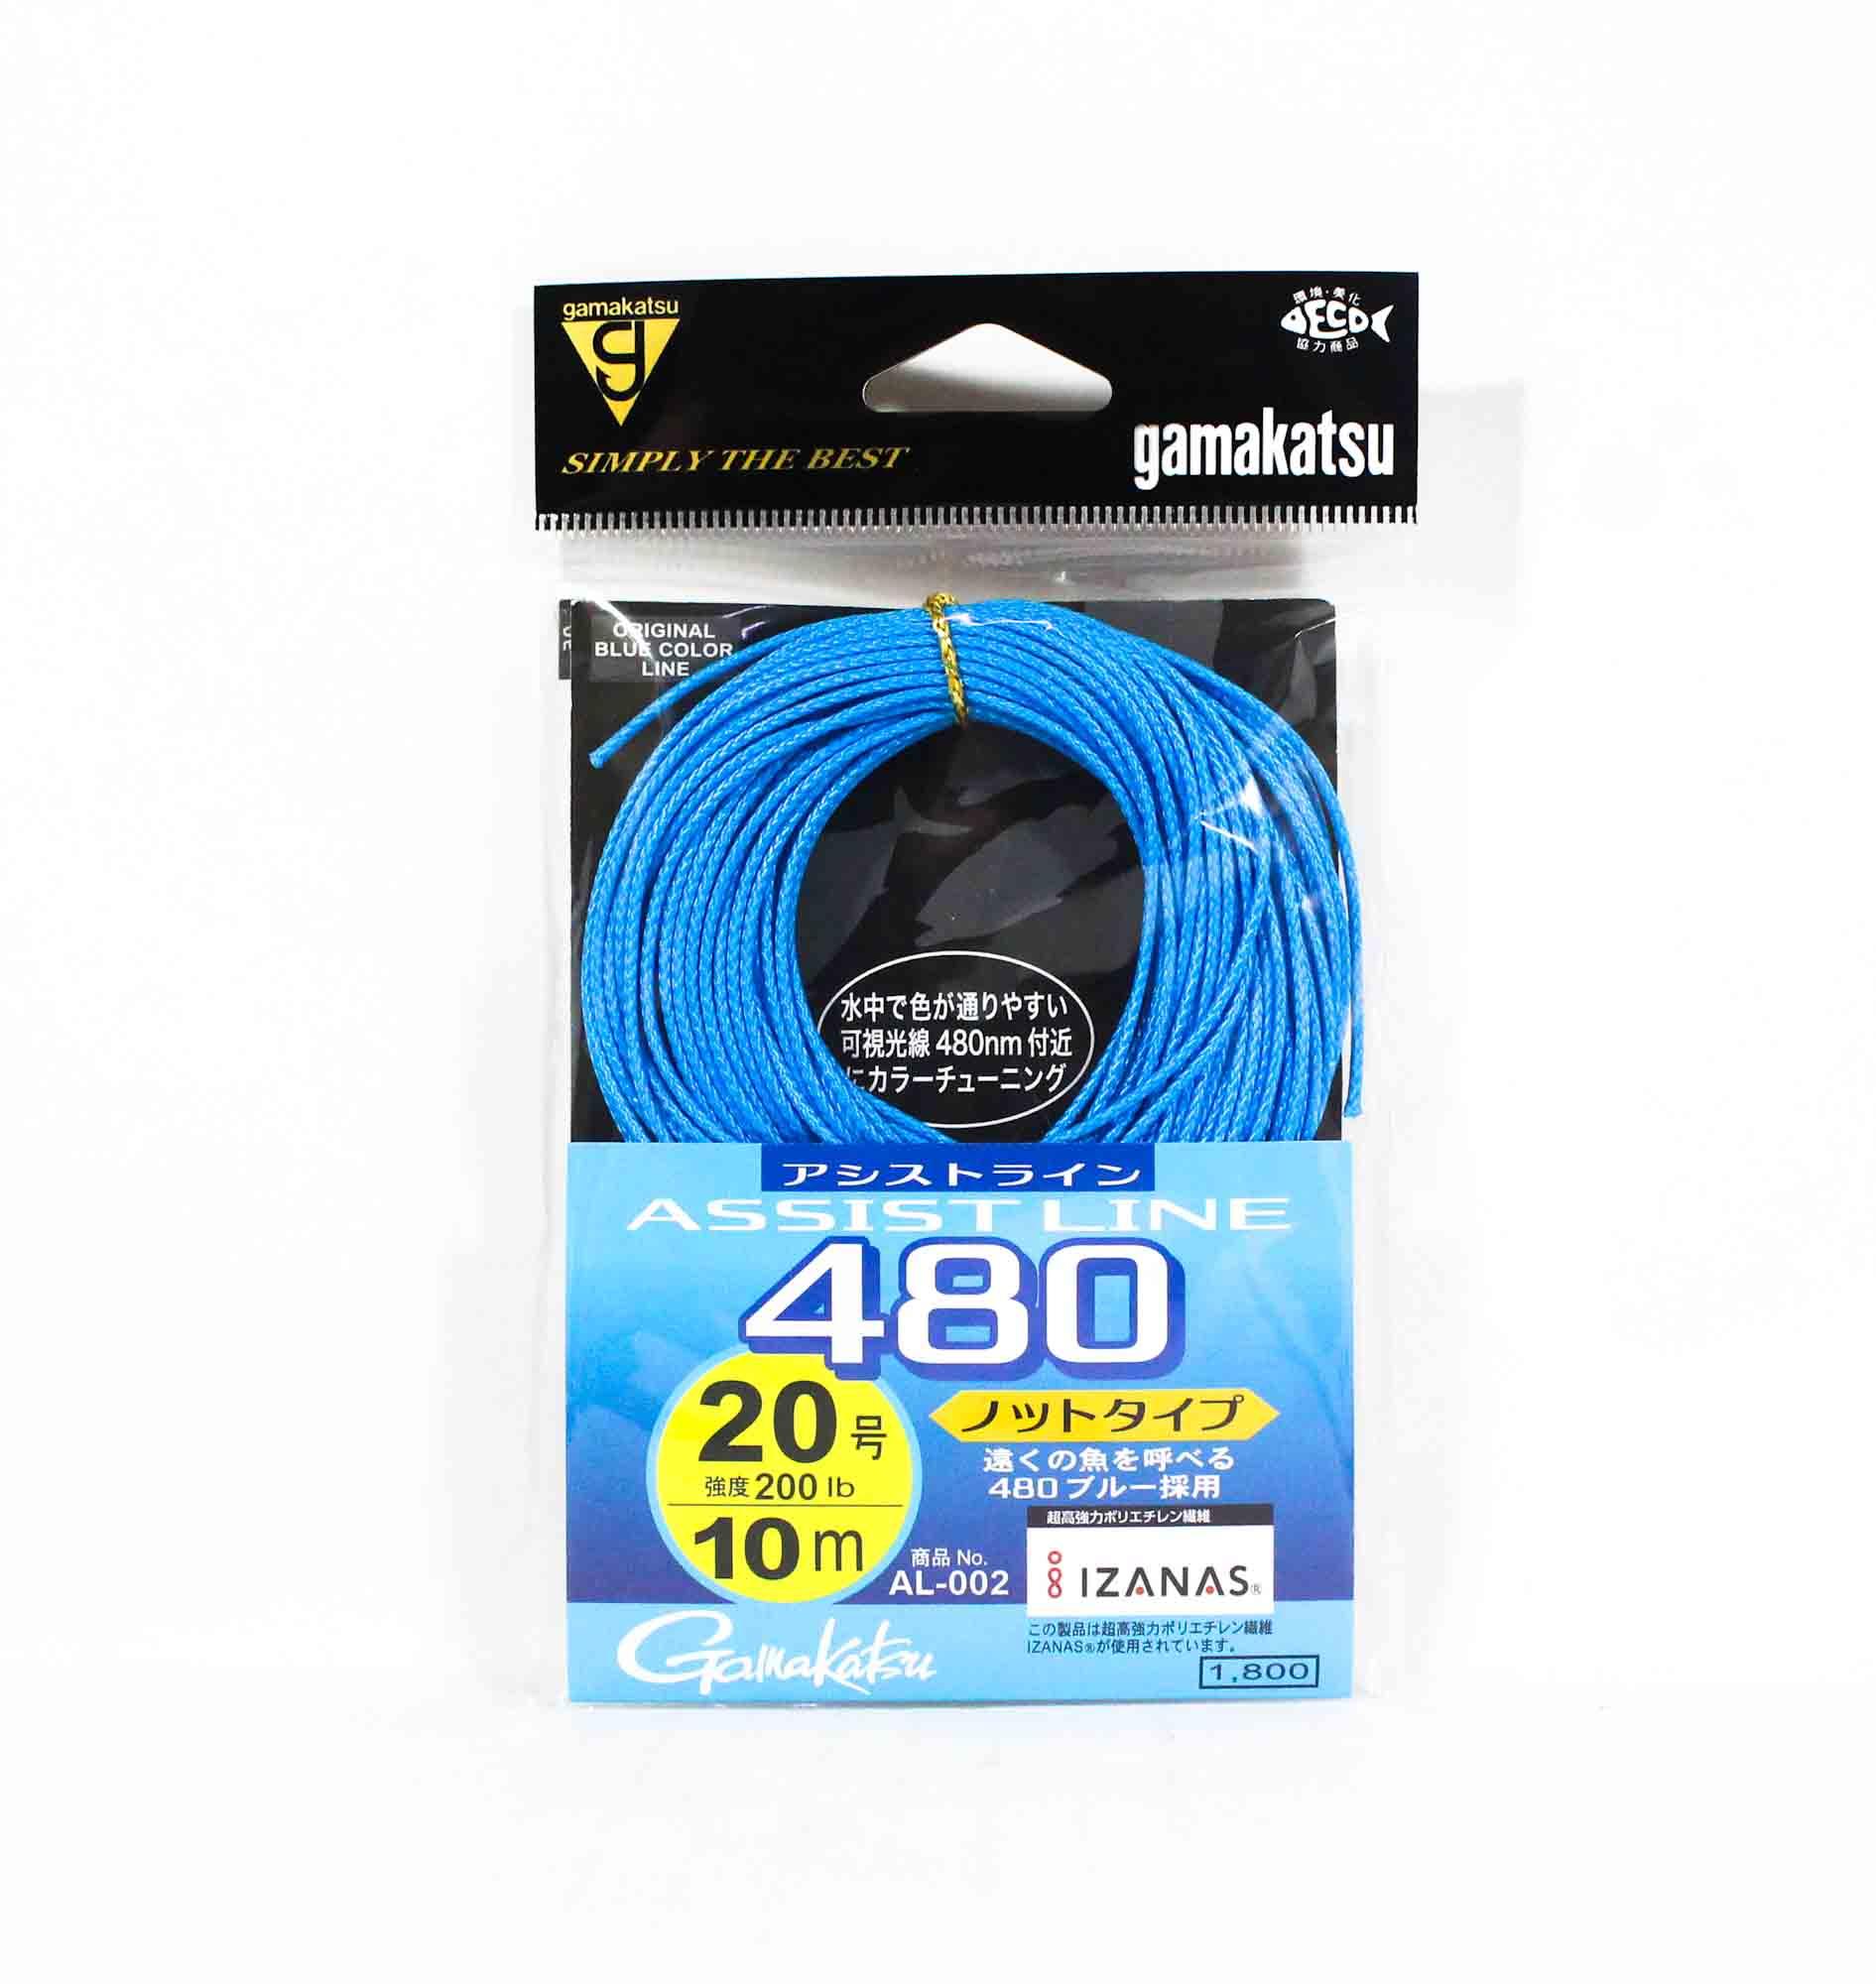 Gamakatsu 19303 AL002 Assist Line 480 Knot Type 10m Size 20 200lb (8517)